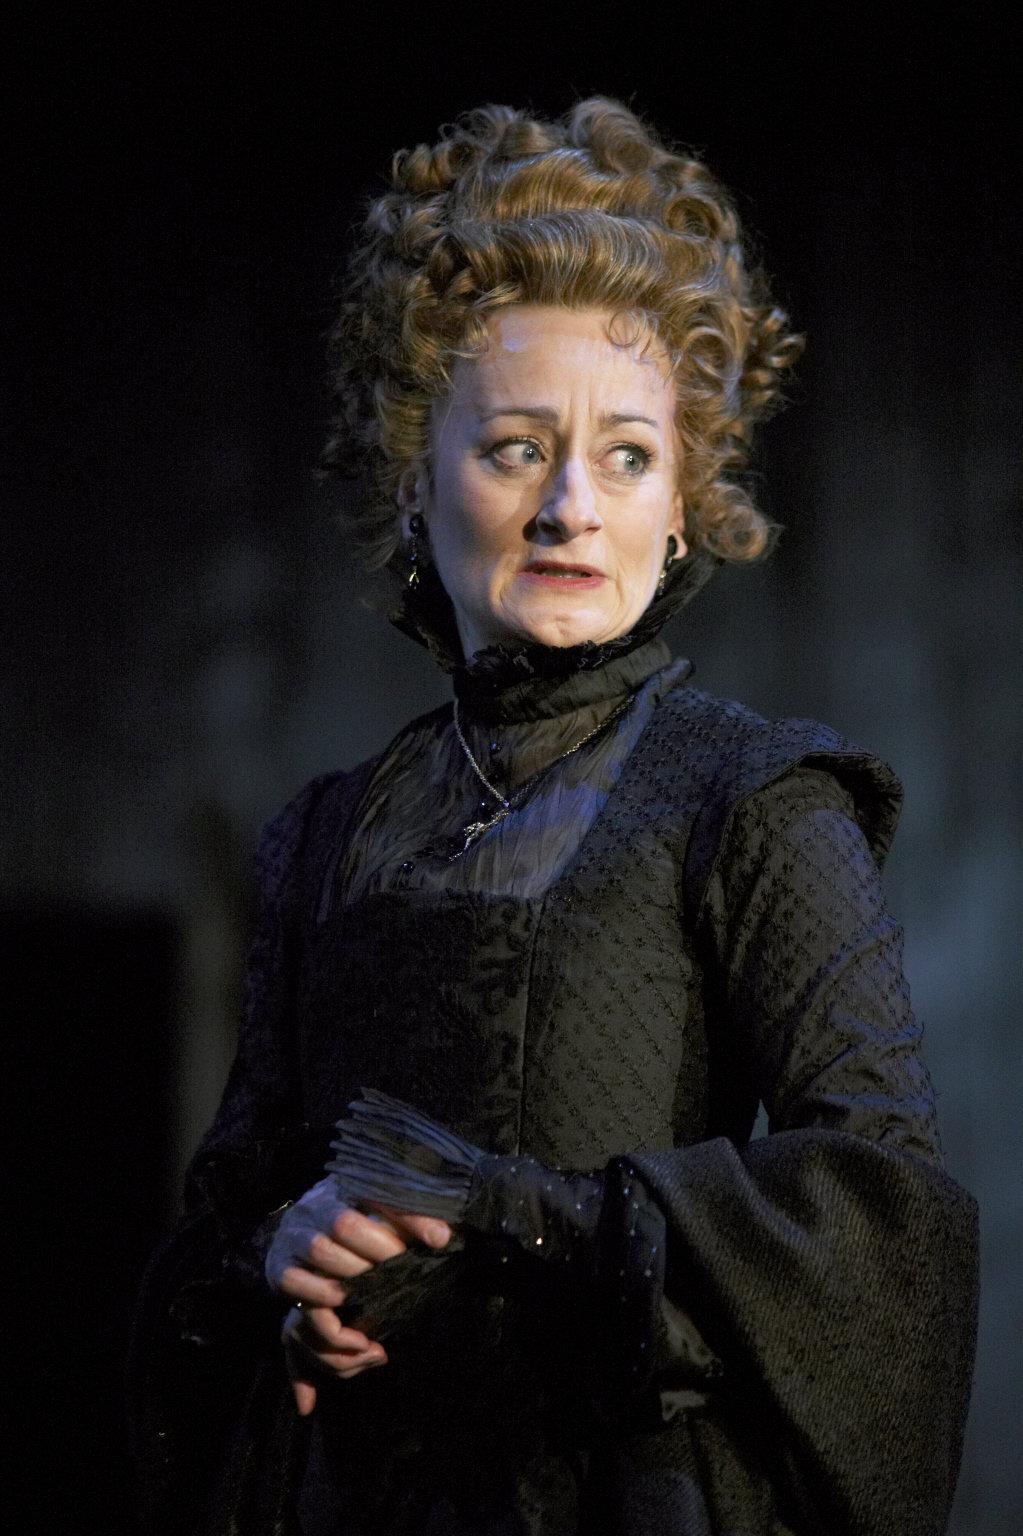 Gertrude in a black dress.